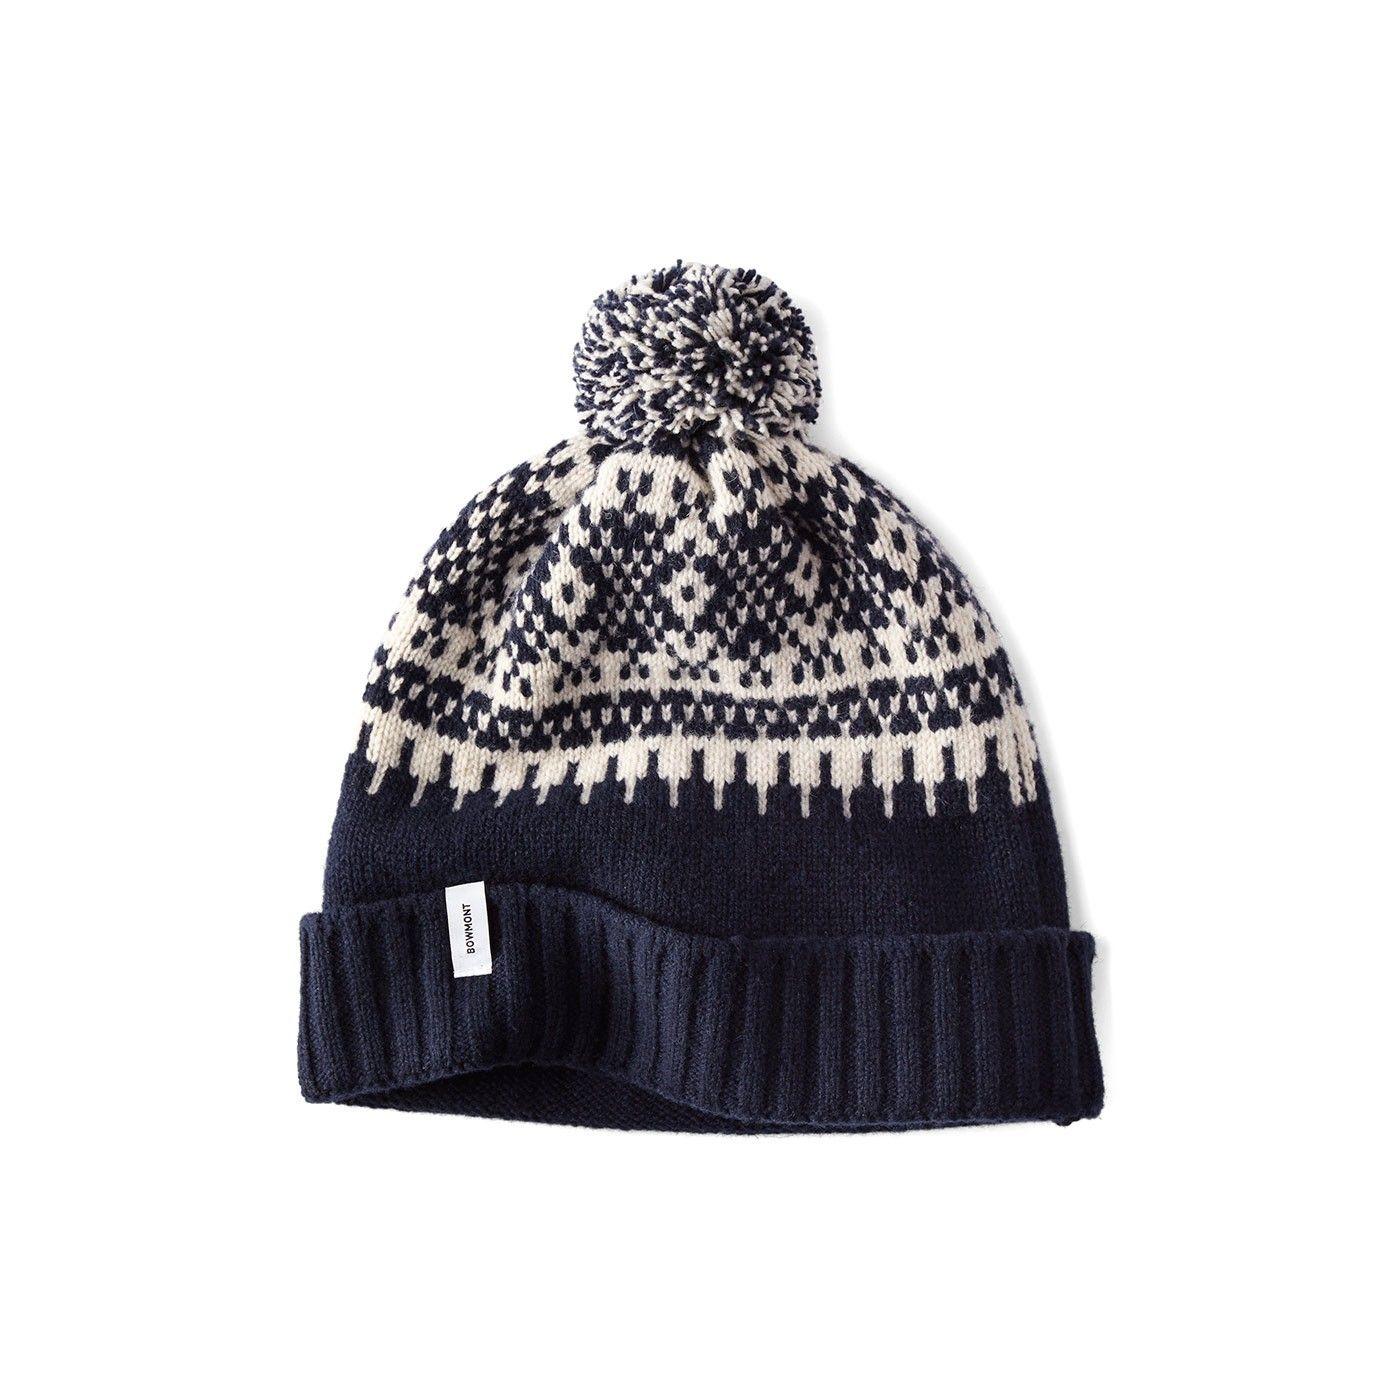 9e32178b6 Cold Water People   Christmas Wishlist   Pinterest   Knitting ...